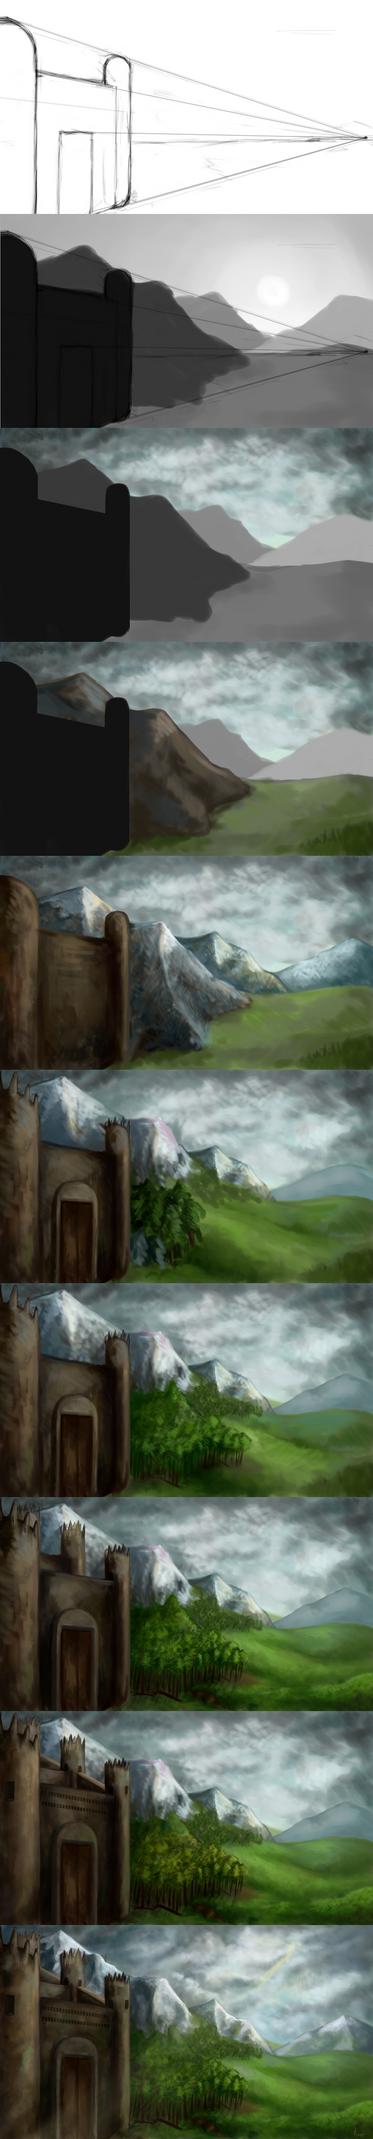 How I draw landscape - step by step by pokePiterr